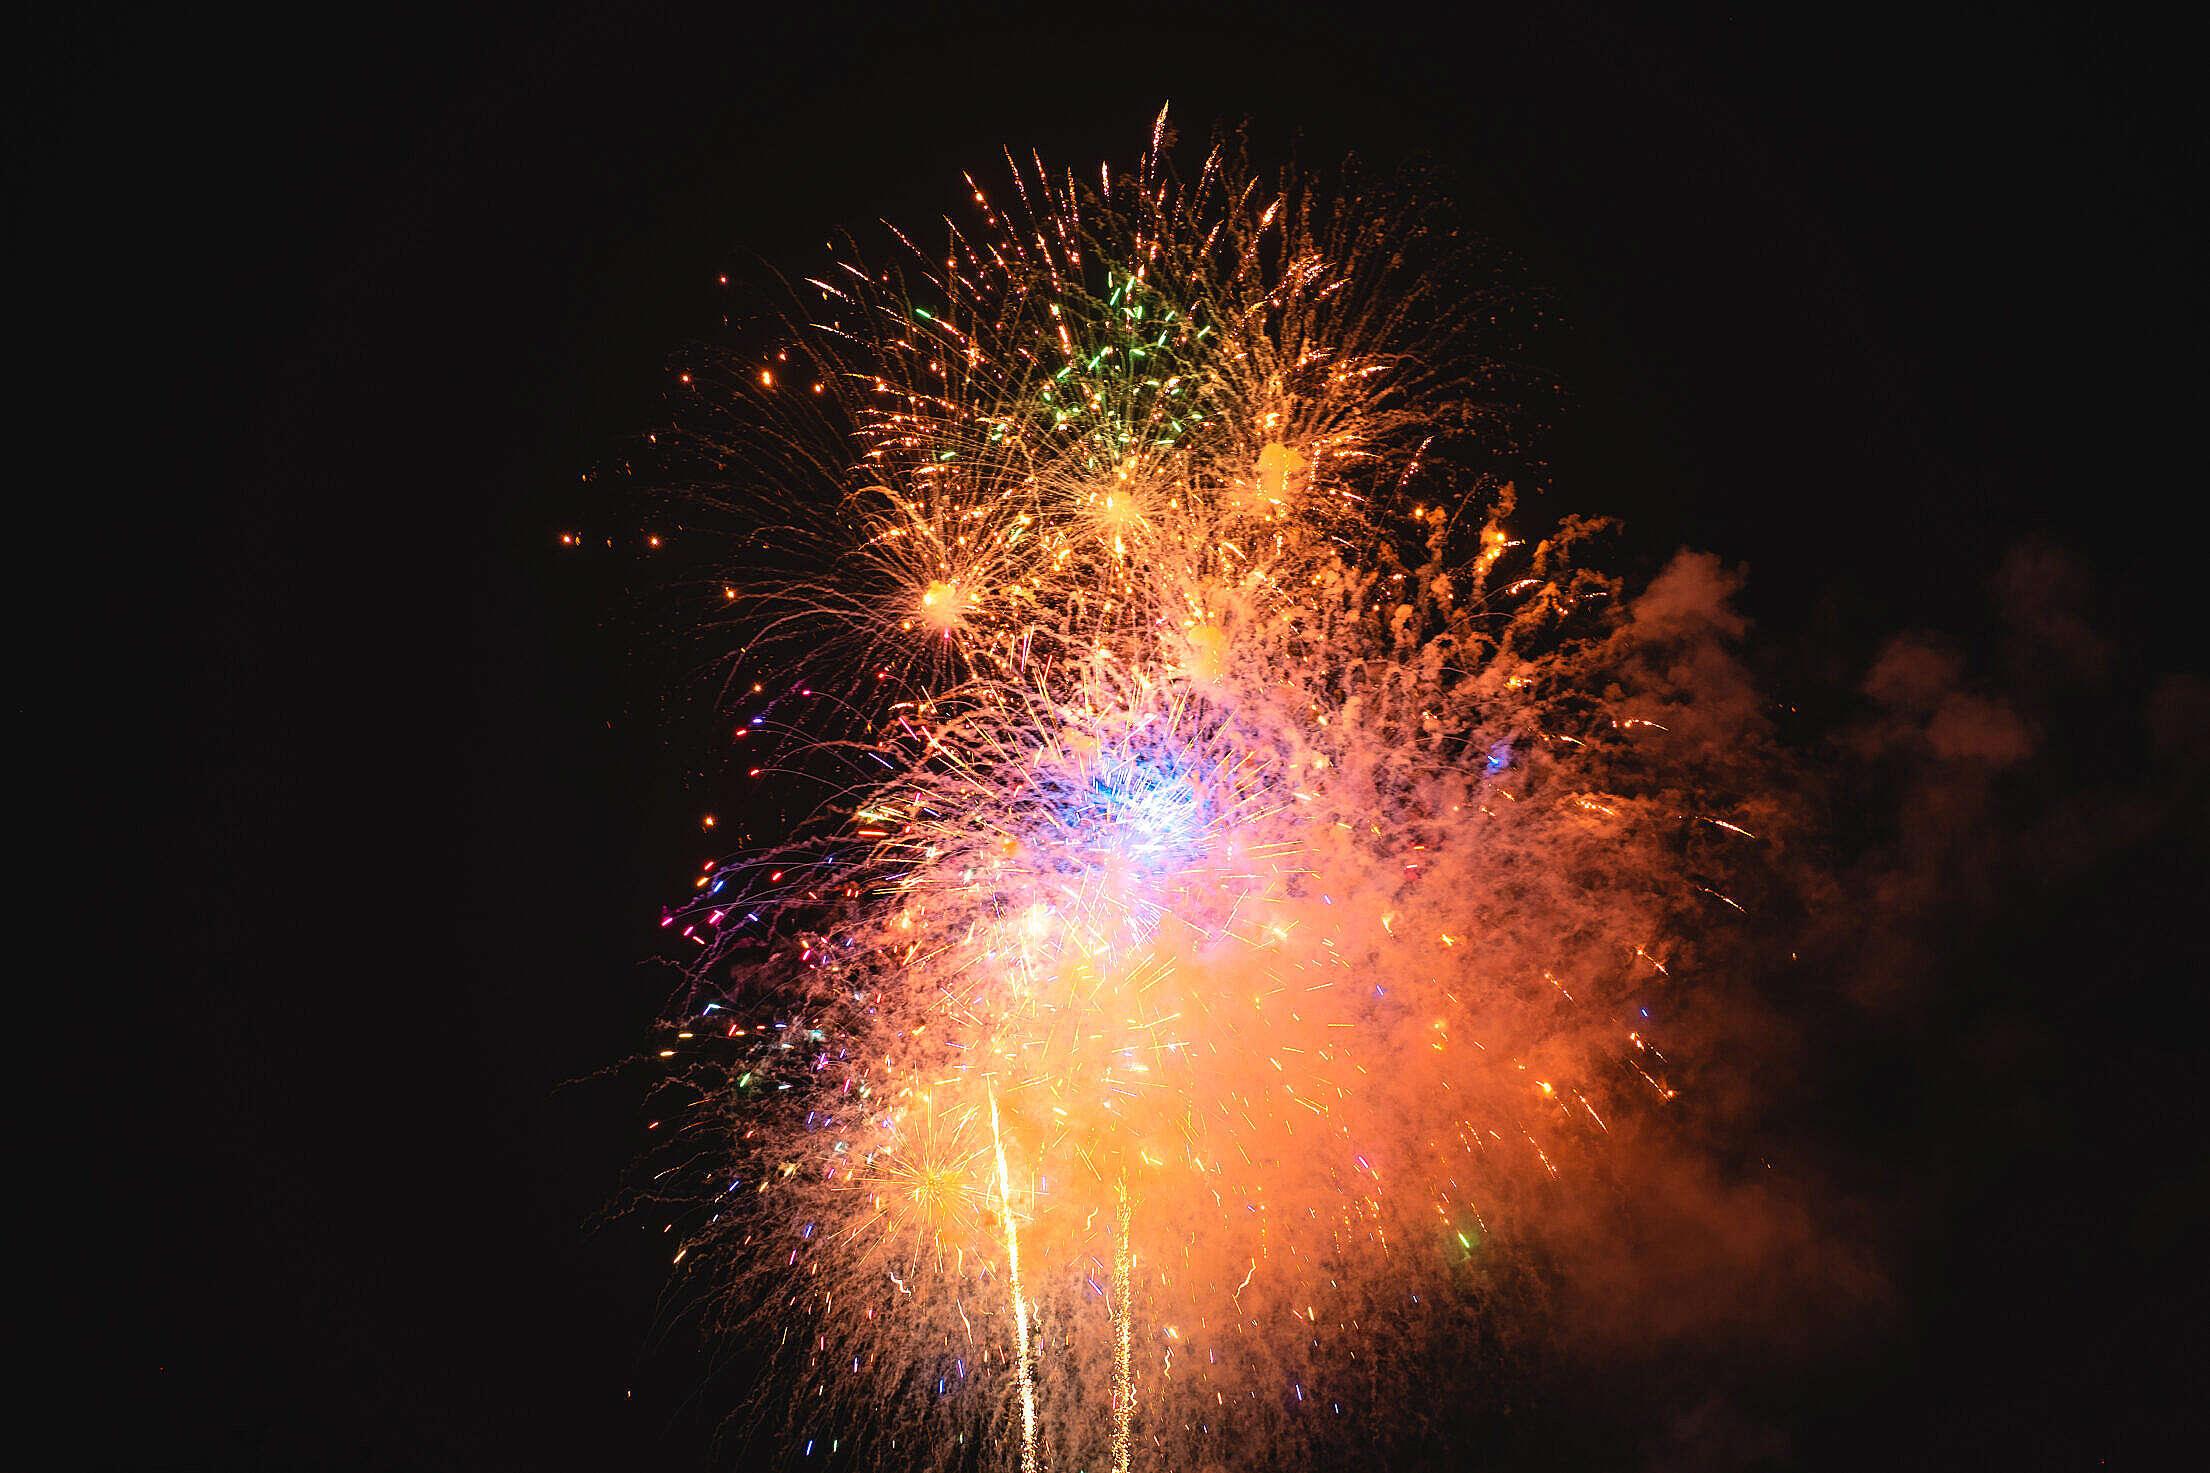 Happy New Year 2020 Fireworks Free Stock Photo